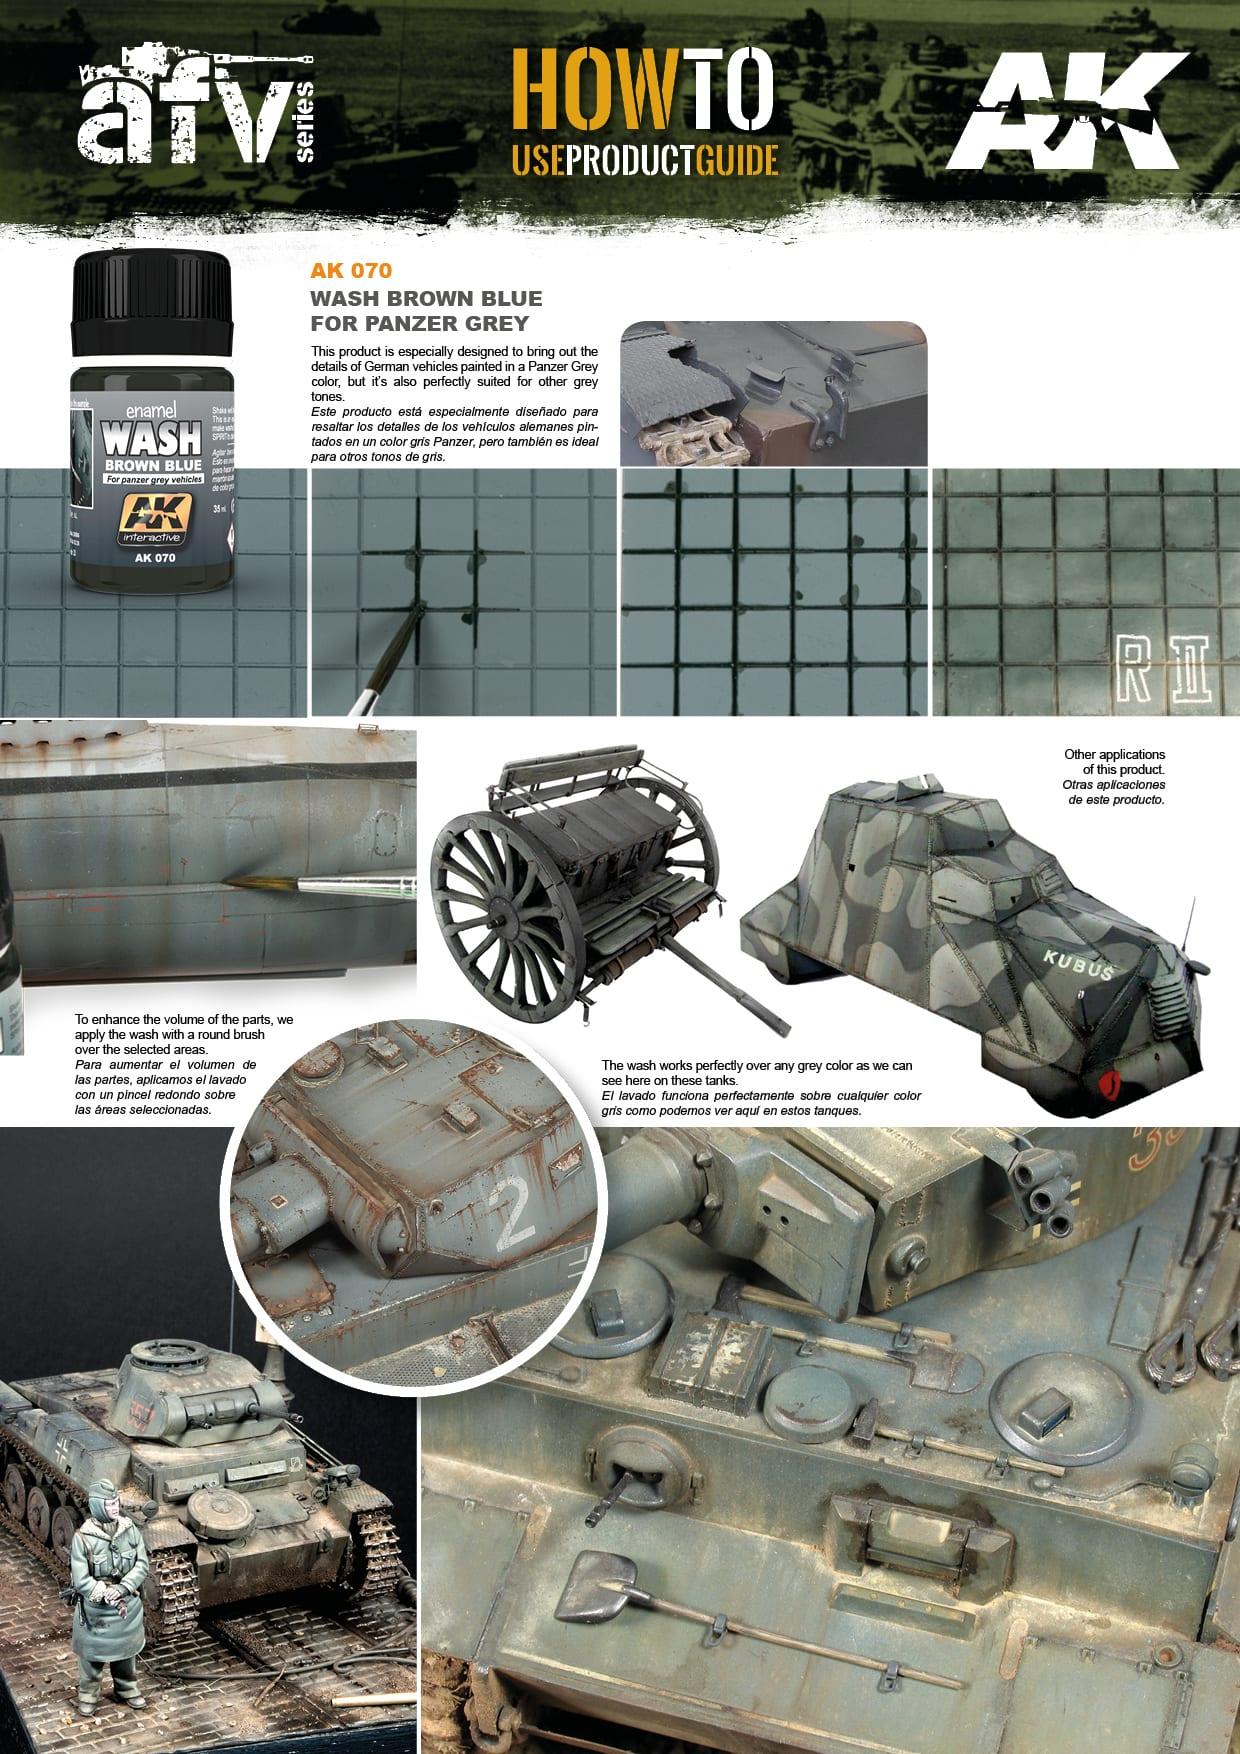 For panzer sale 4 Heng Long